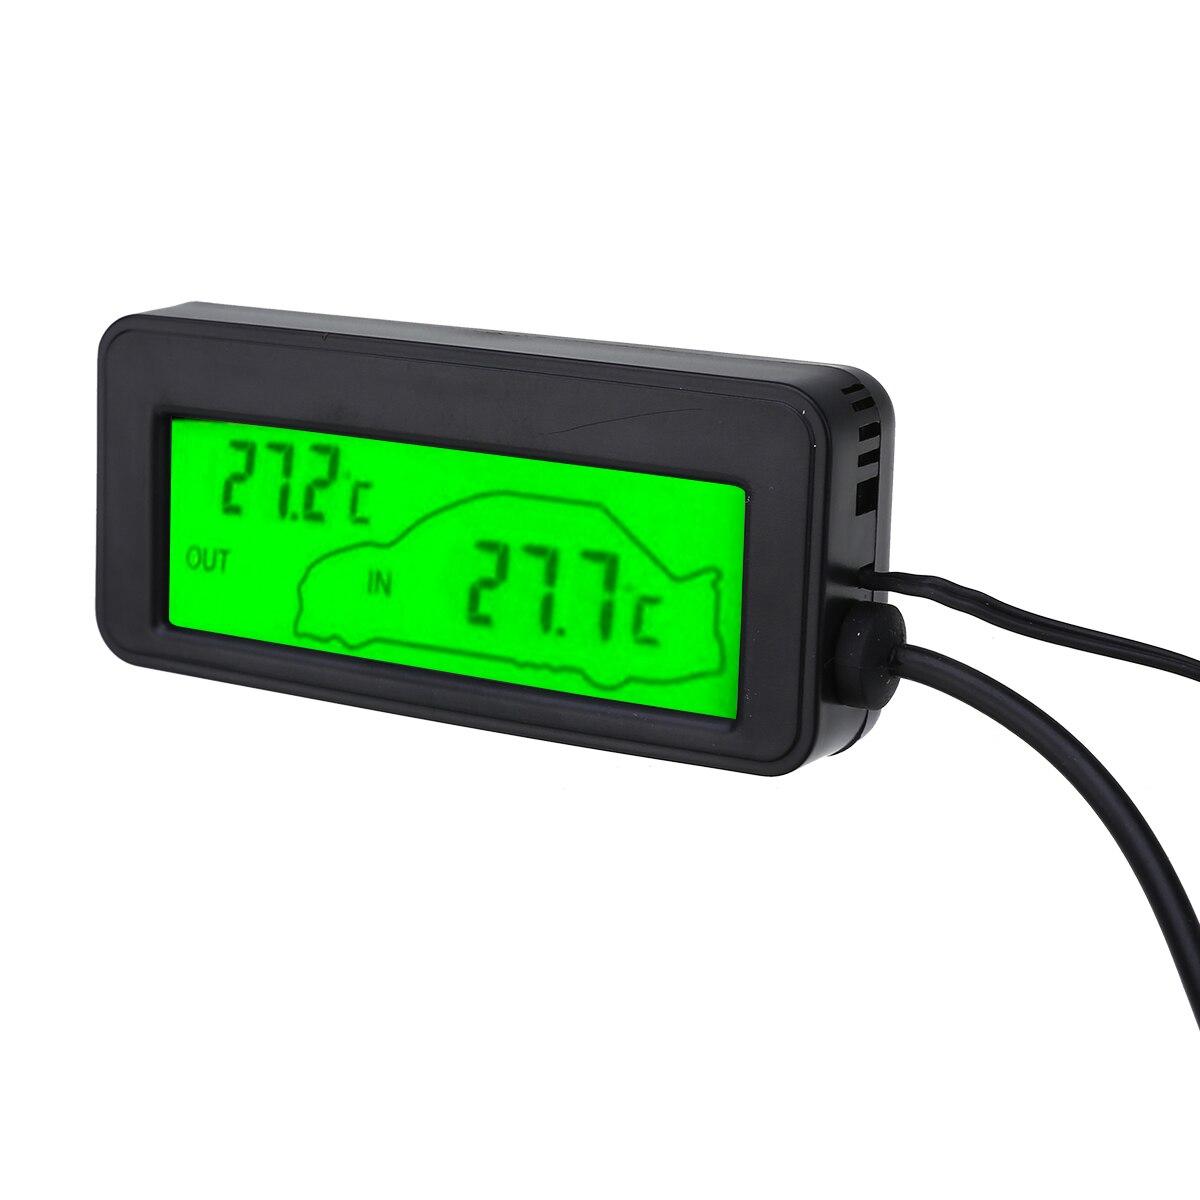 DC12V Car Digital Thermometer LCD Car Inside//Outside Temp Meter Gauge Green